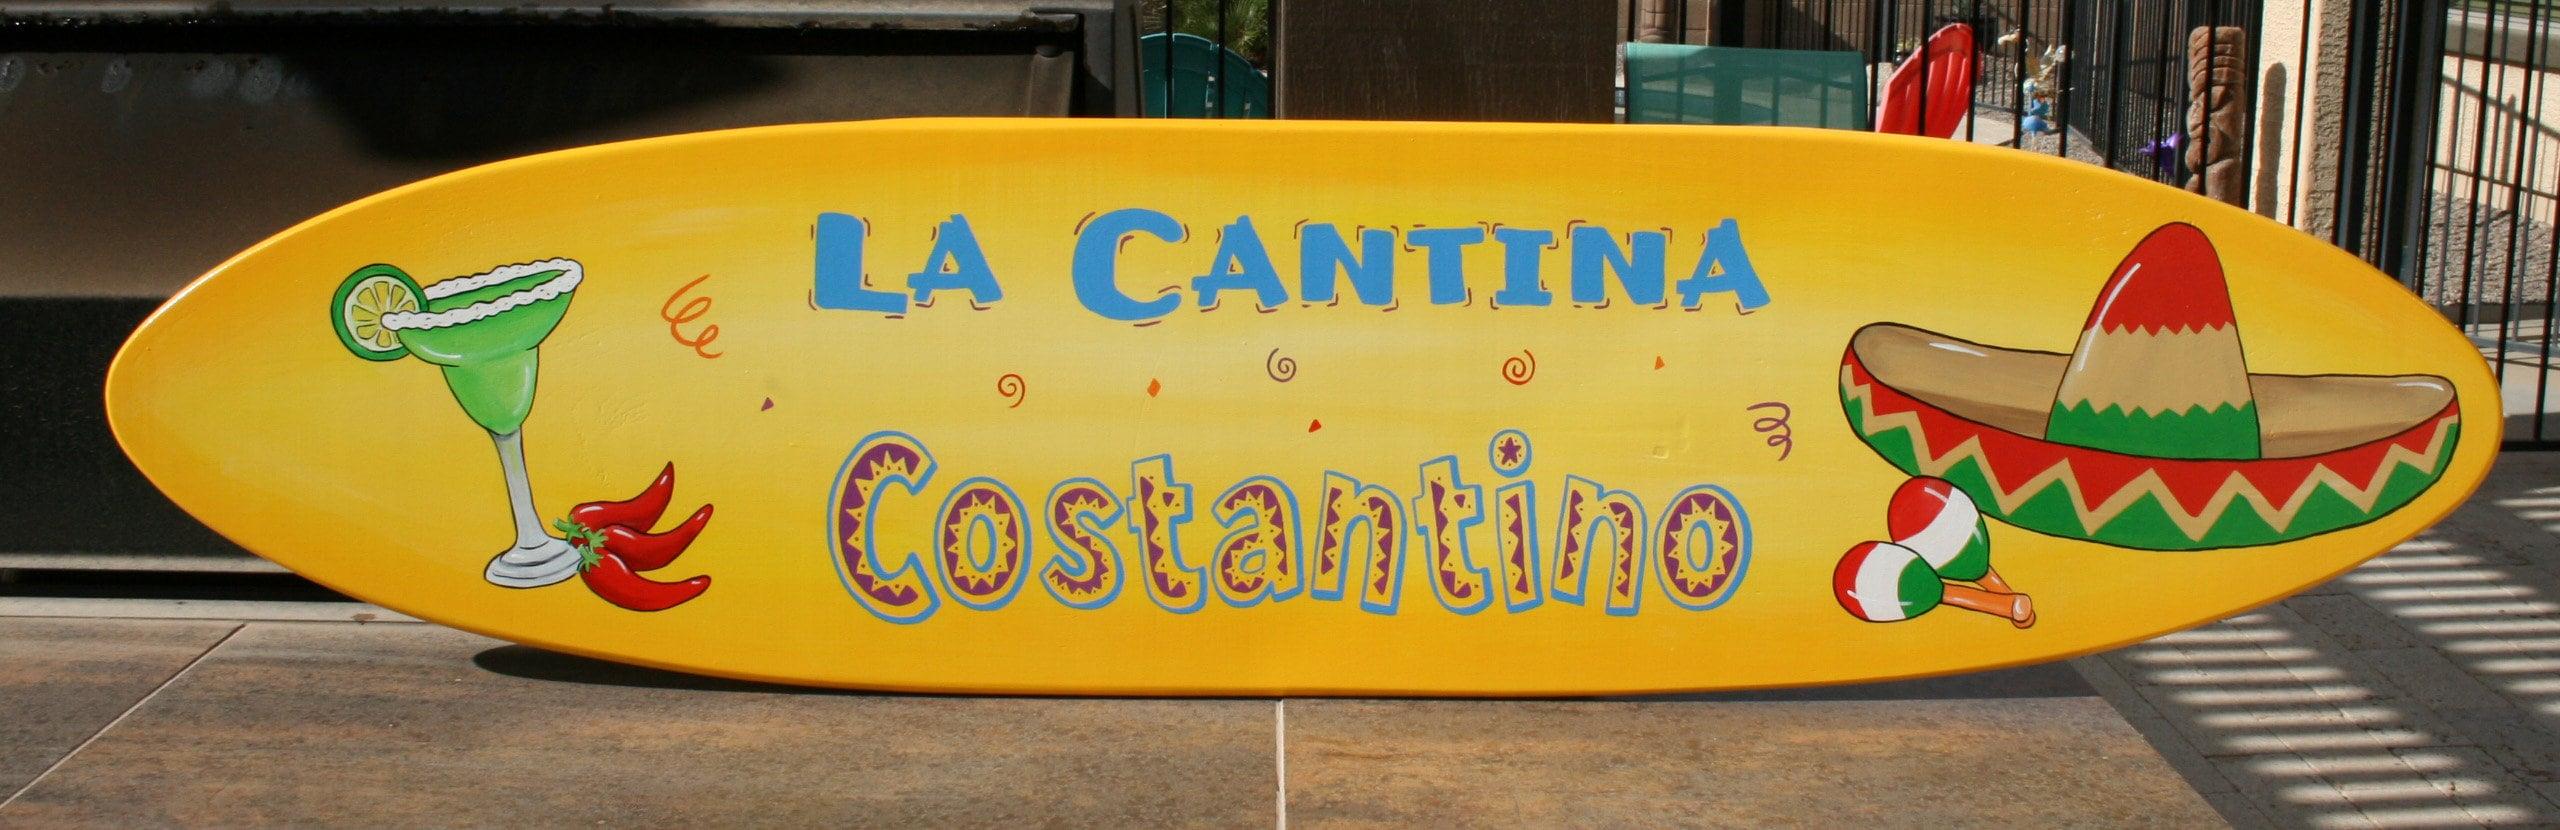 surfboard wall art cantina sign mexico theme mexican bar